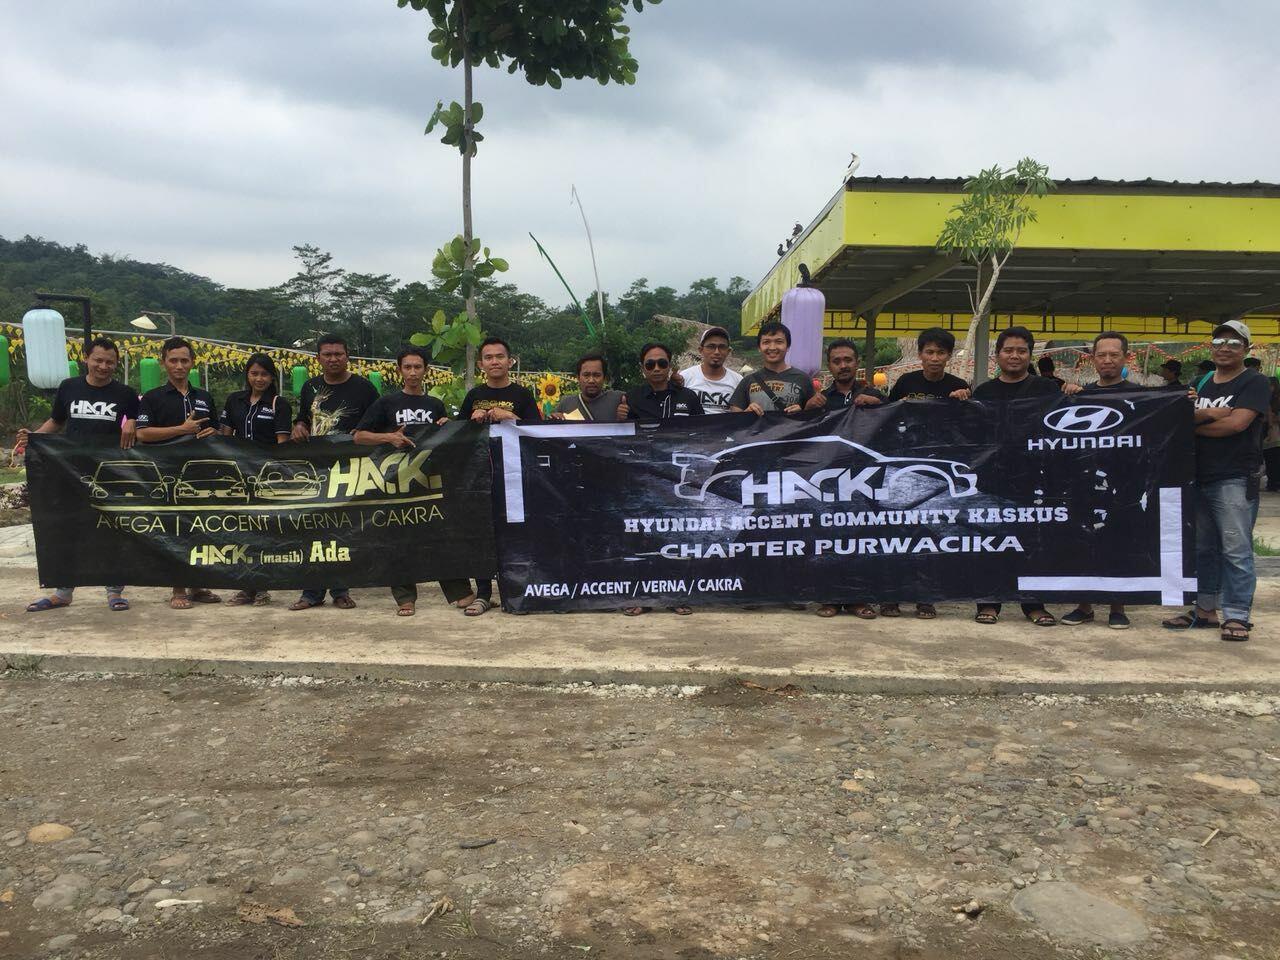 Hyundai Accent Series Avega Excel Cakra Underground Community Evaporator Trajet Balakanhg Kaskus Part3 New